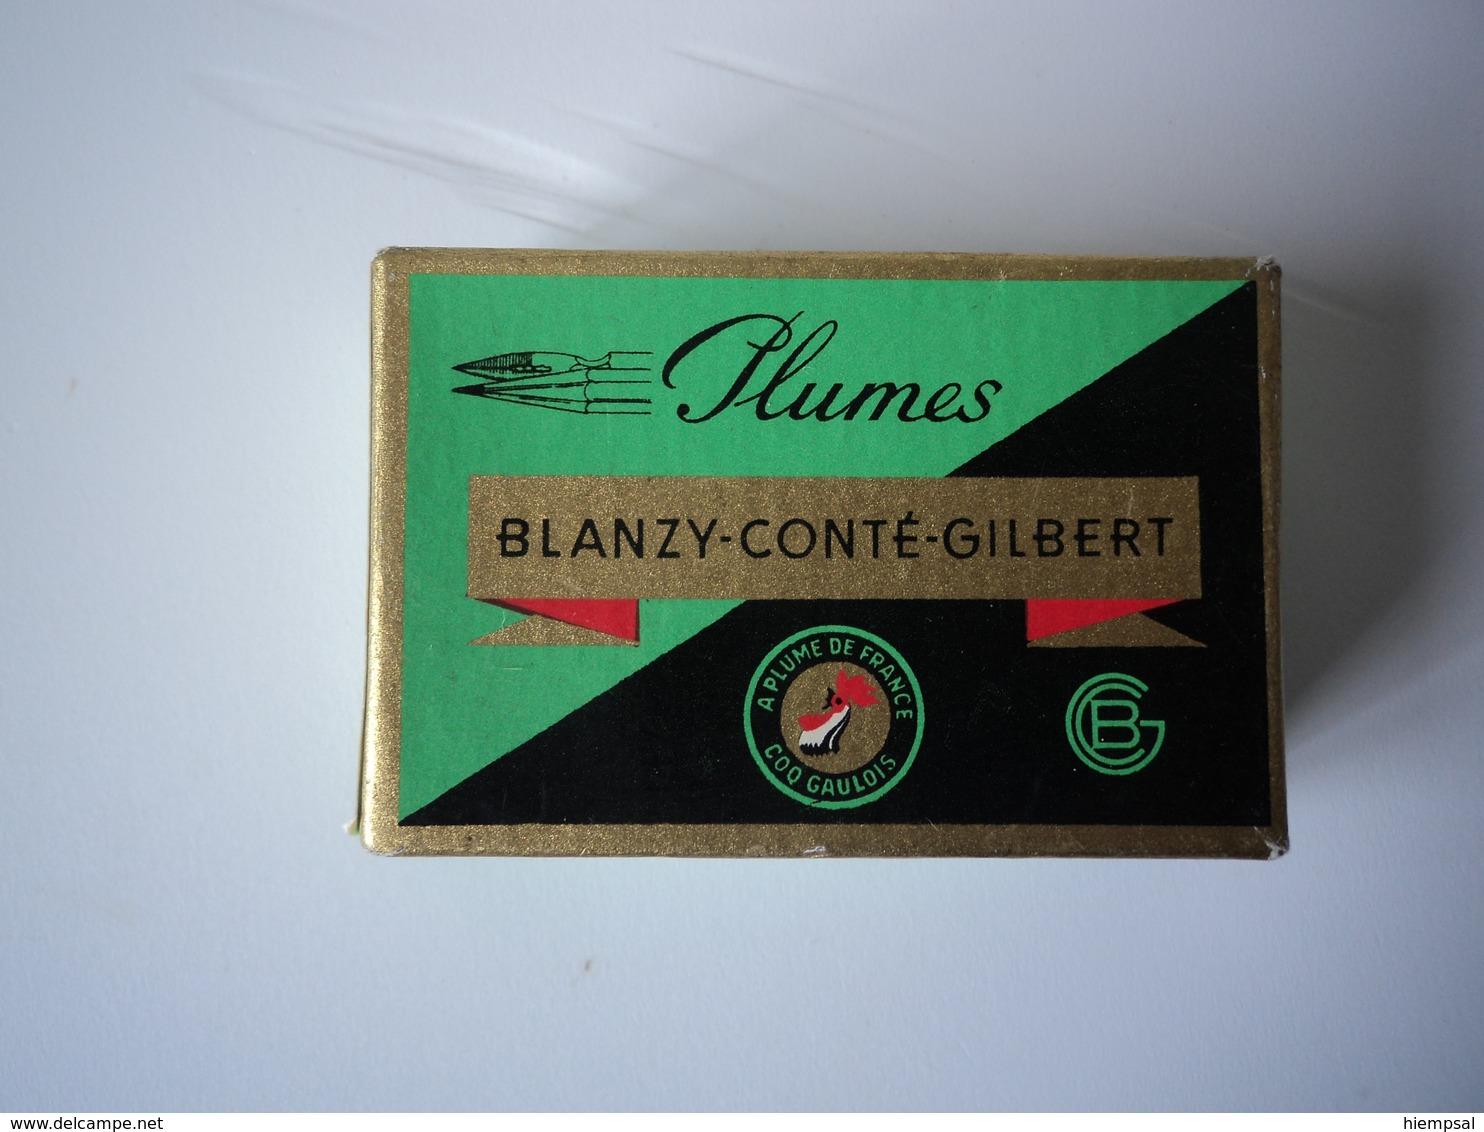 Boite Neuf  De 100 Plumes   Babillarde  Cementee   N° 2770  Blazy- Conté- Gilbert   Plomble - Plumes